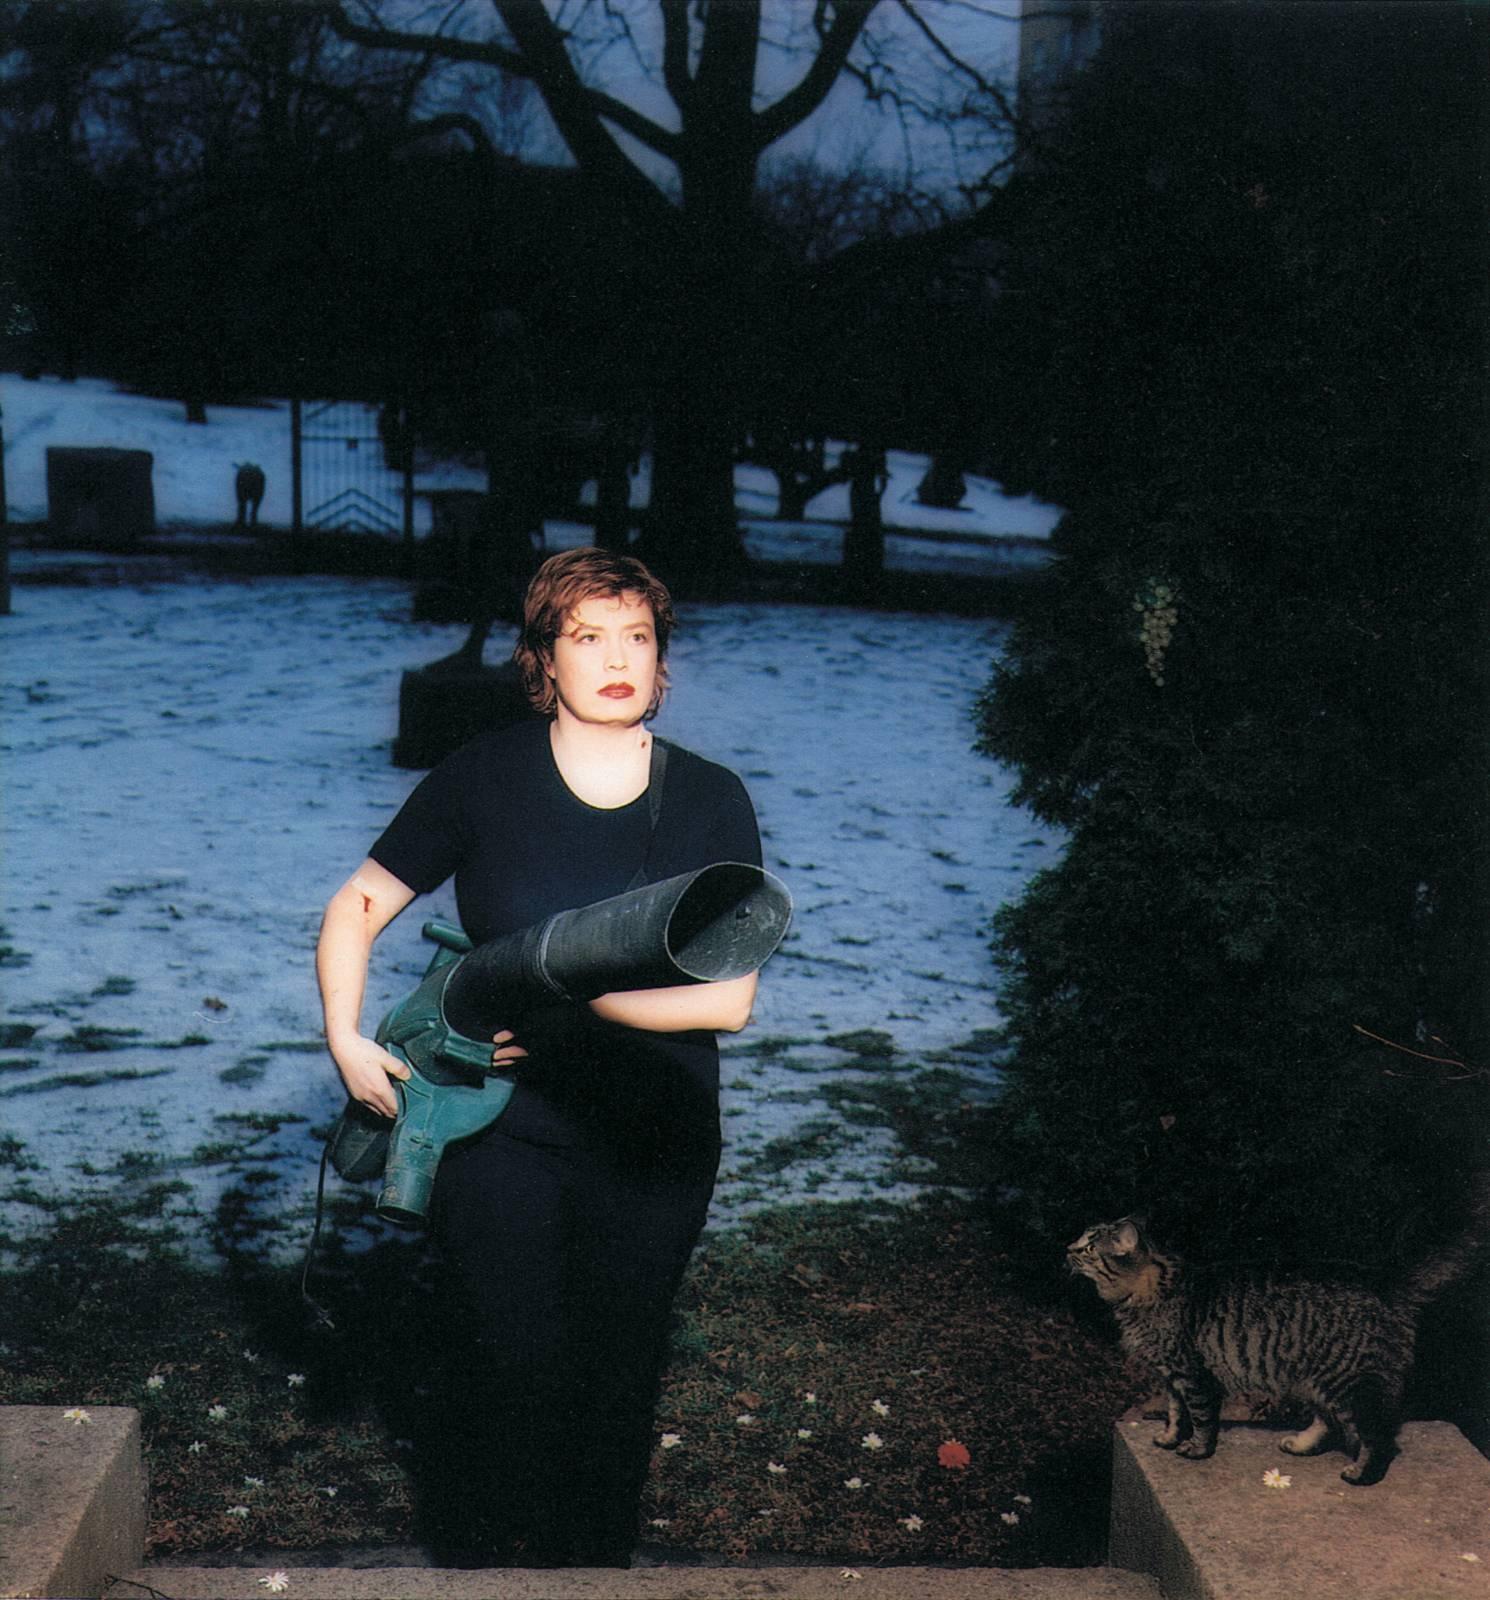 From the Garden, 2000, C-print, 100 x 100 cm